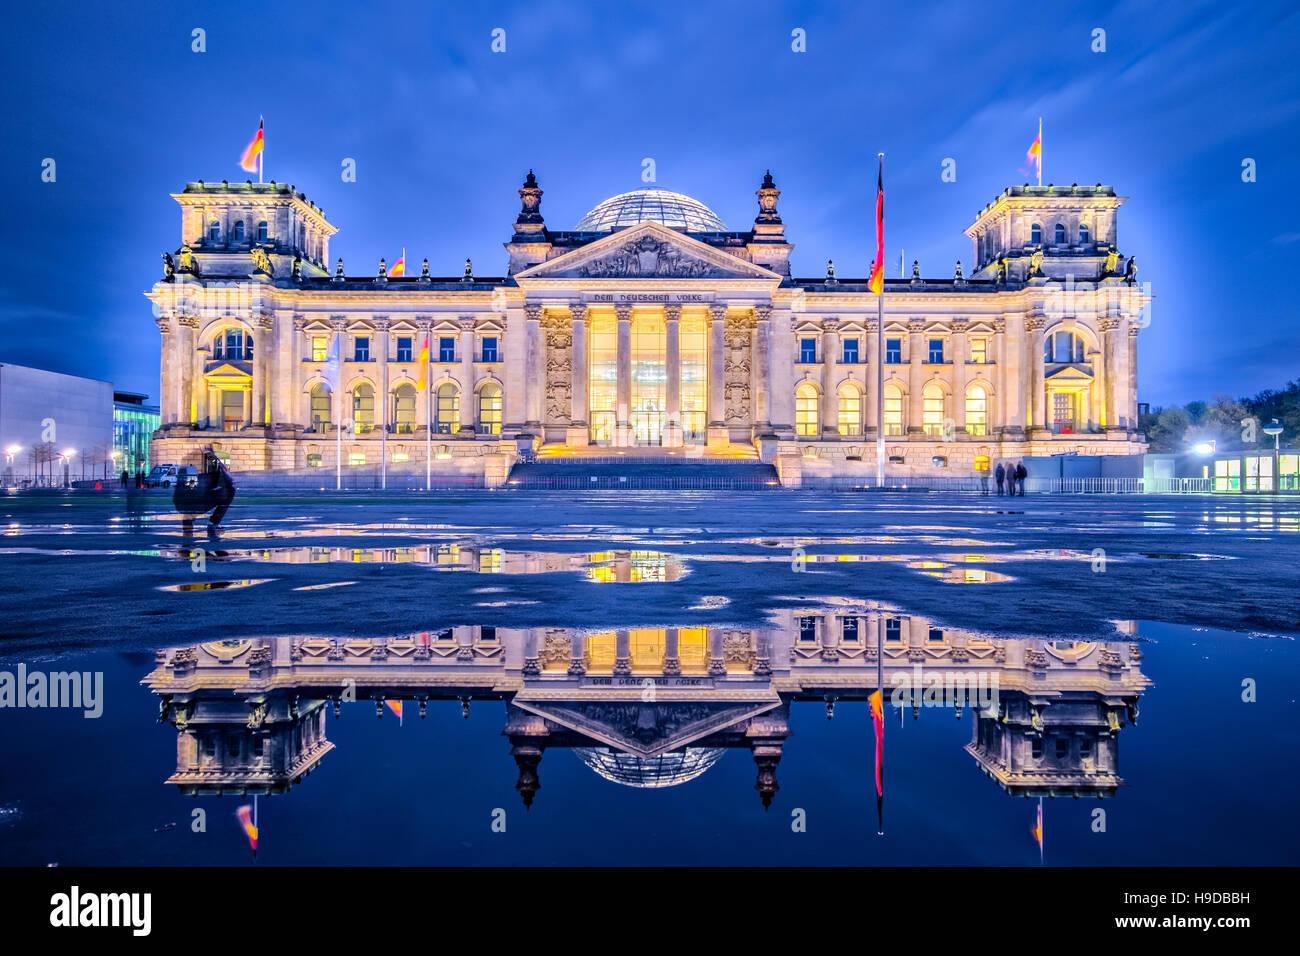 Night in Berlin, The Reichstag building or Deutscher Bundestag in Berlin, Germany. - Stock Image